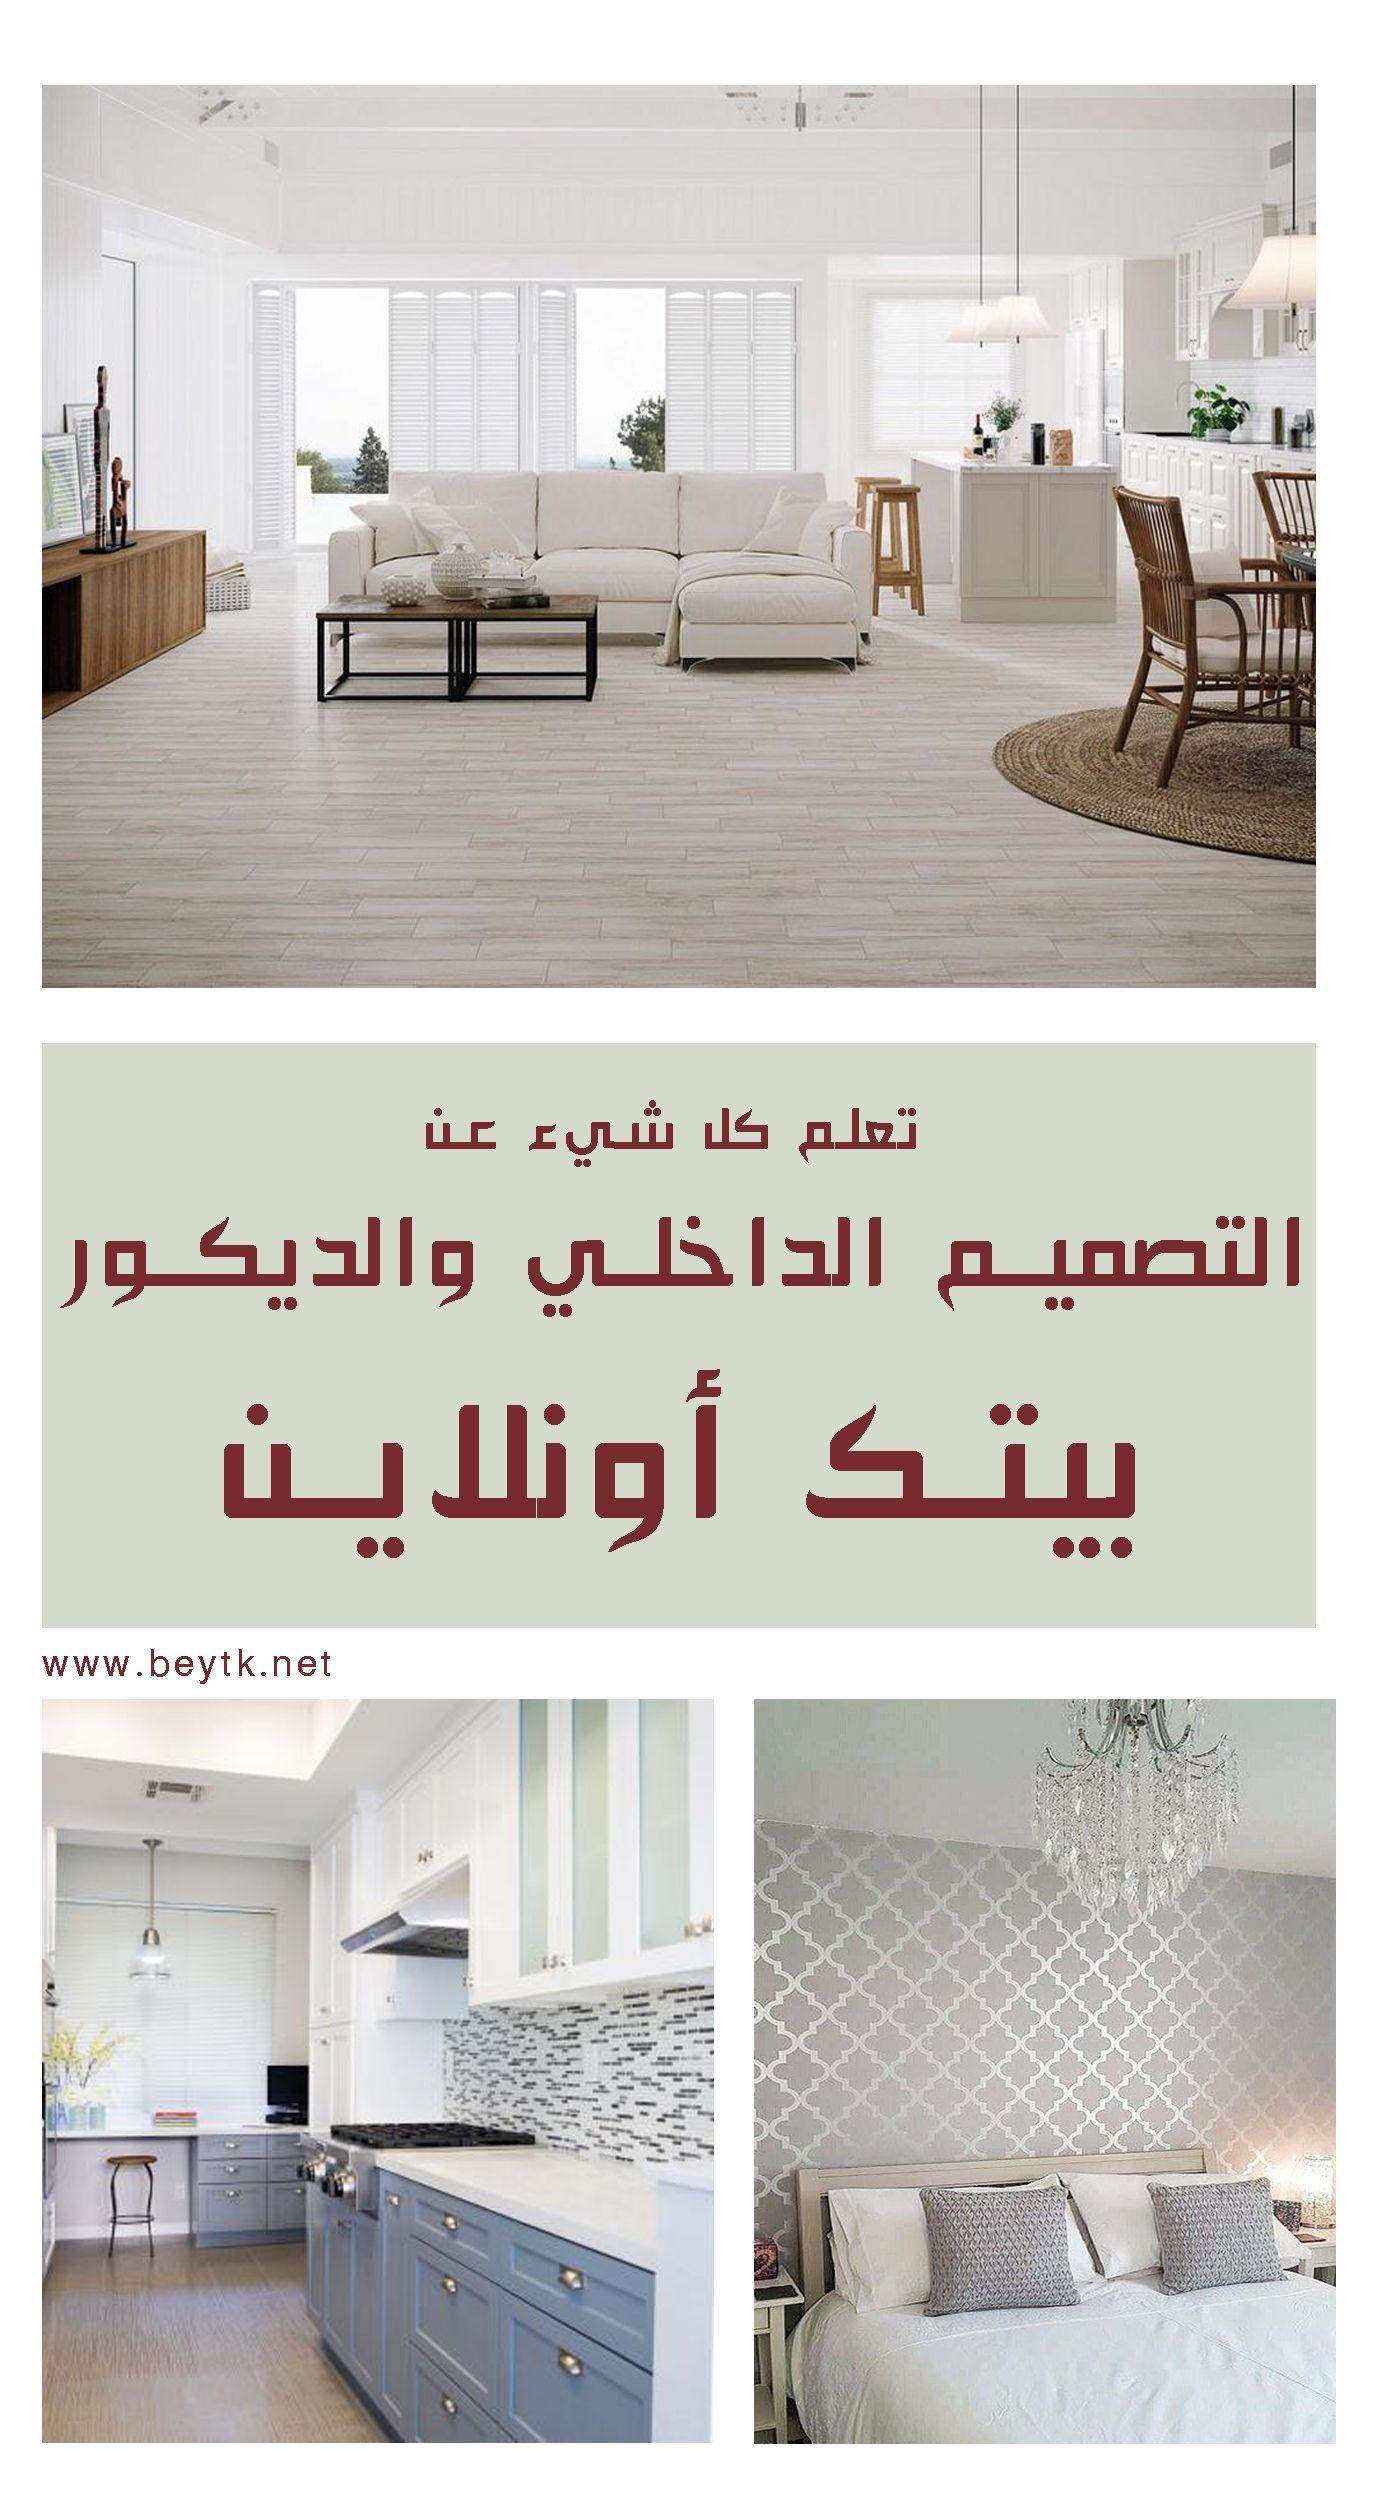 تصميم بيتك خطوة بخطوة Home Home Decor Furniture